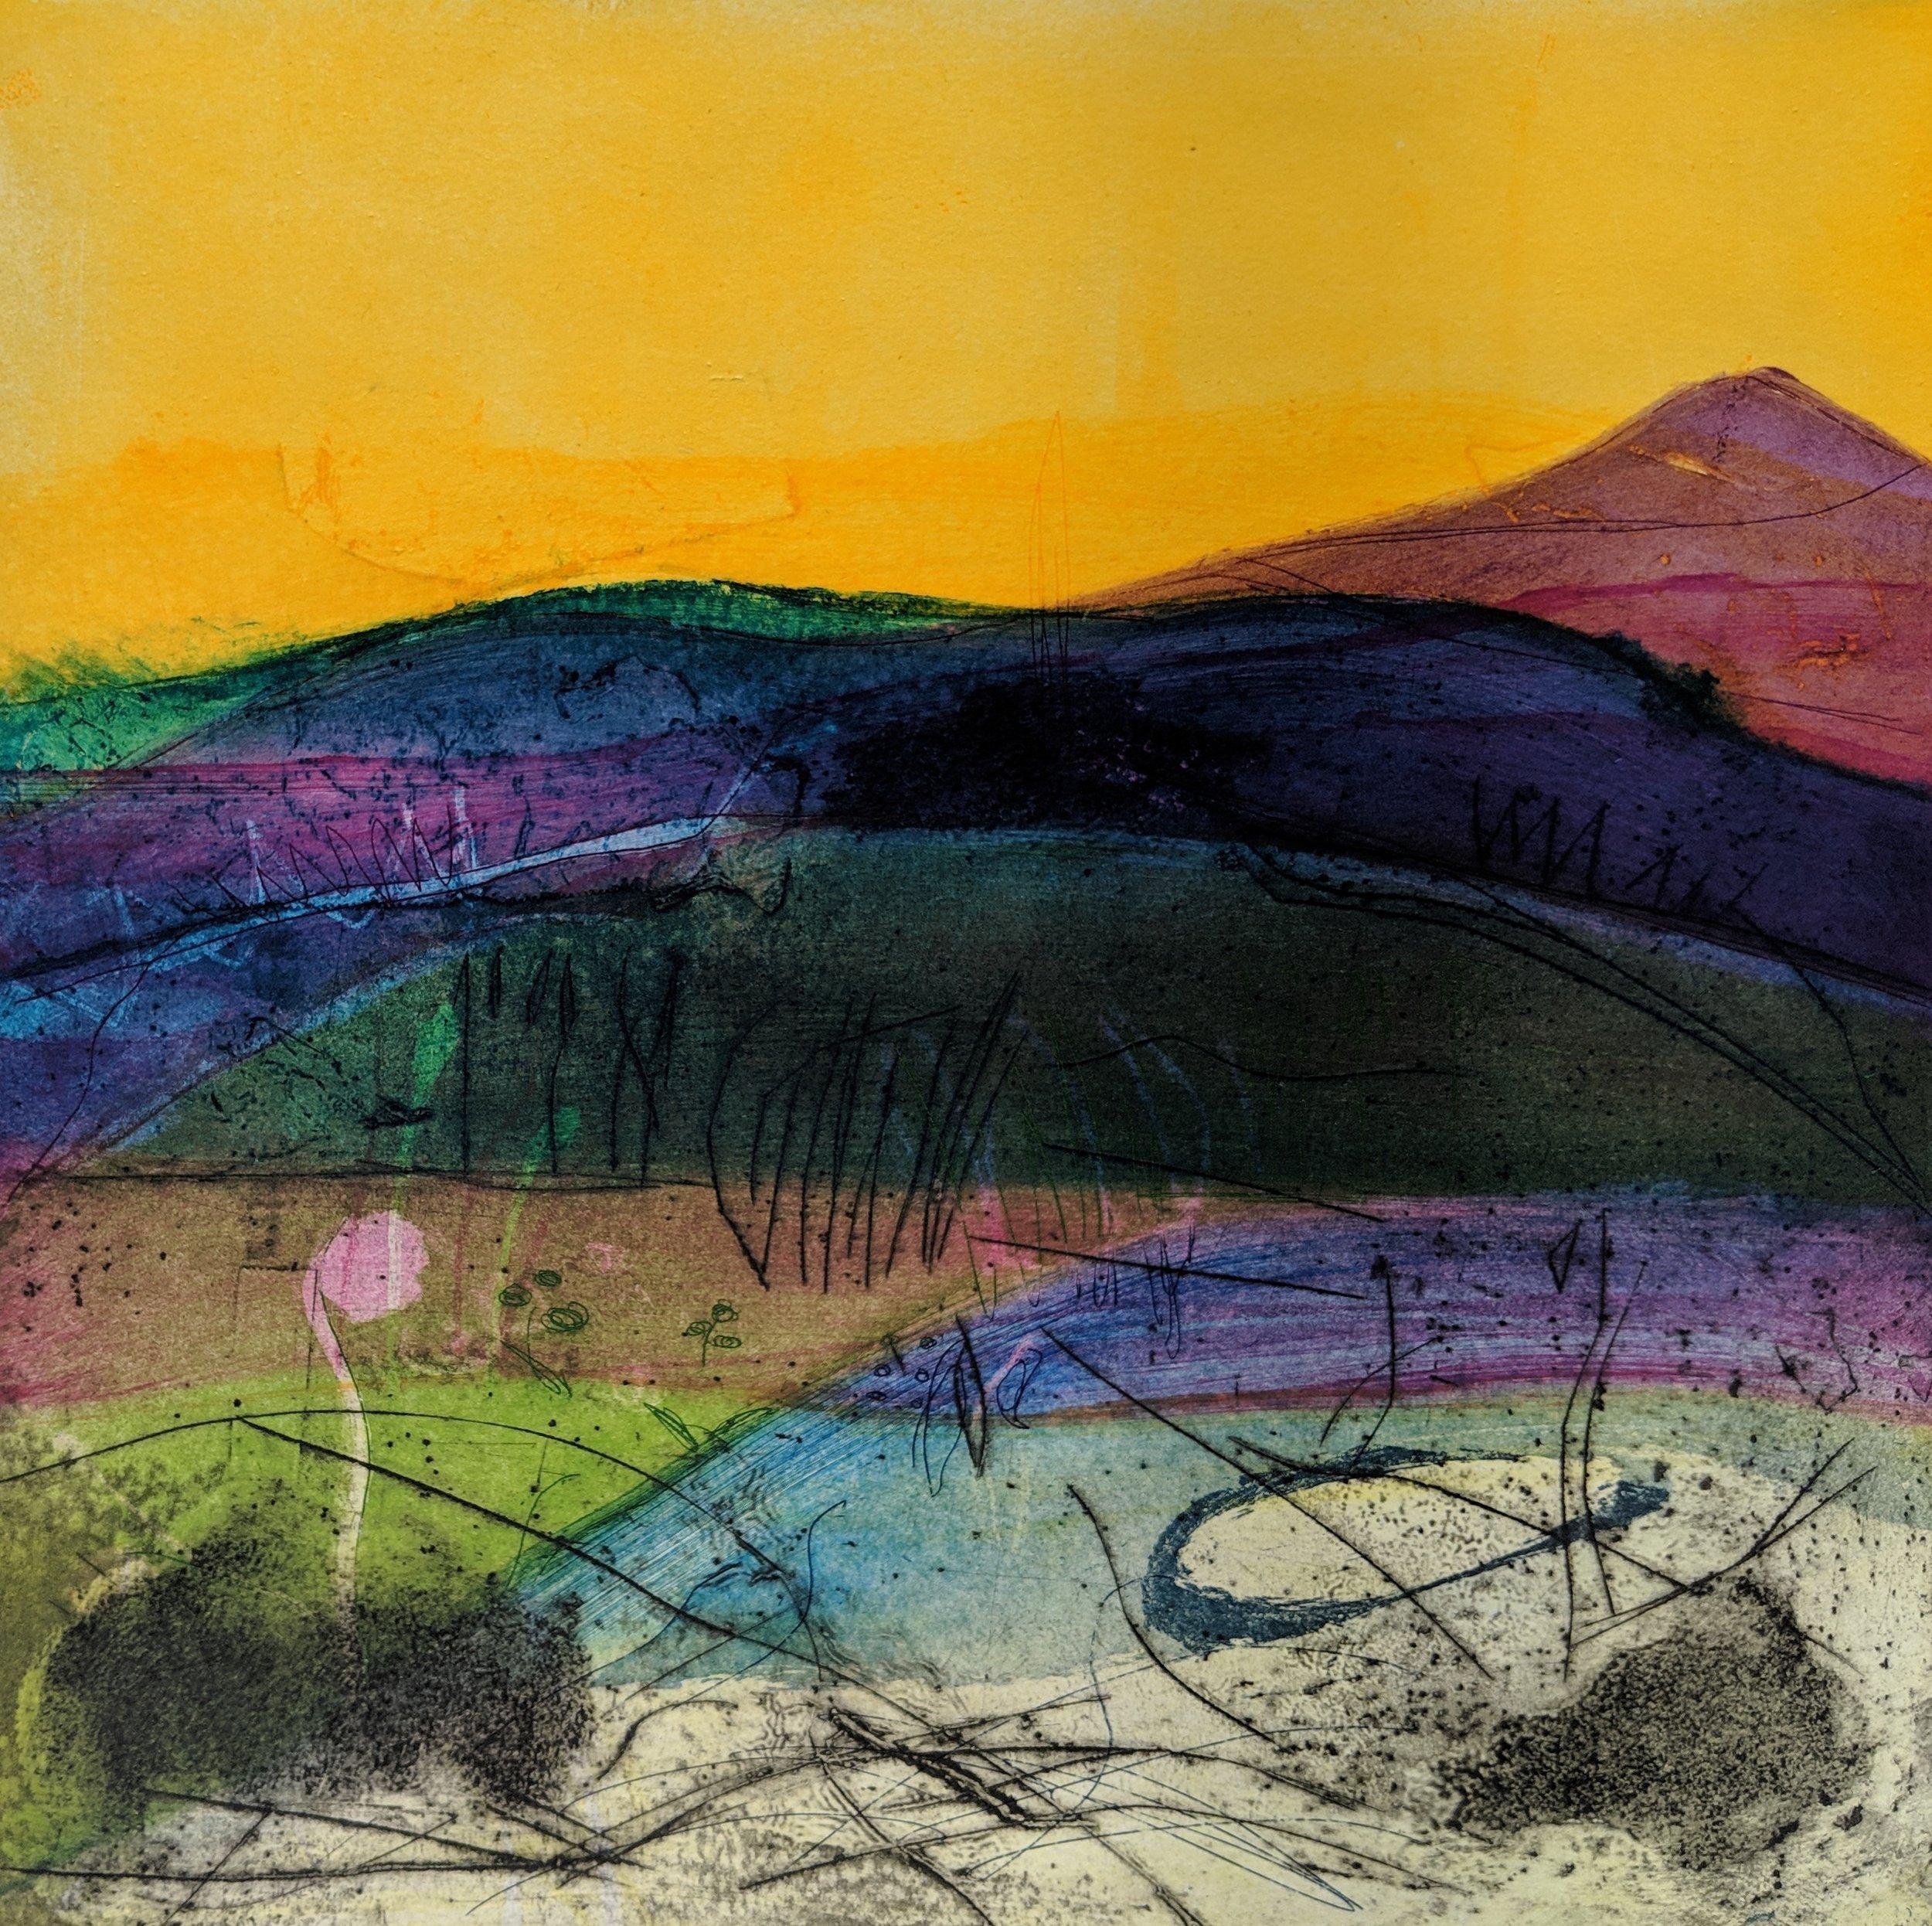 Artist: Louise Davies  Title: Autumn Glow  Size: 33 x 33 cm  Medium: Etching  (edition 1 / 75)  Price: £350 fr